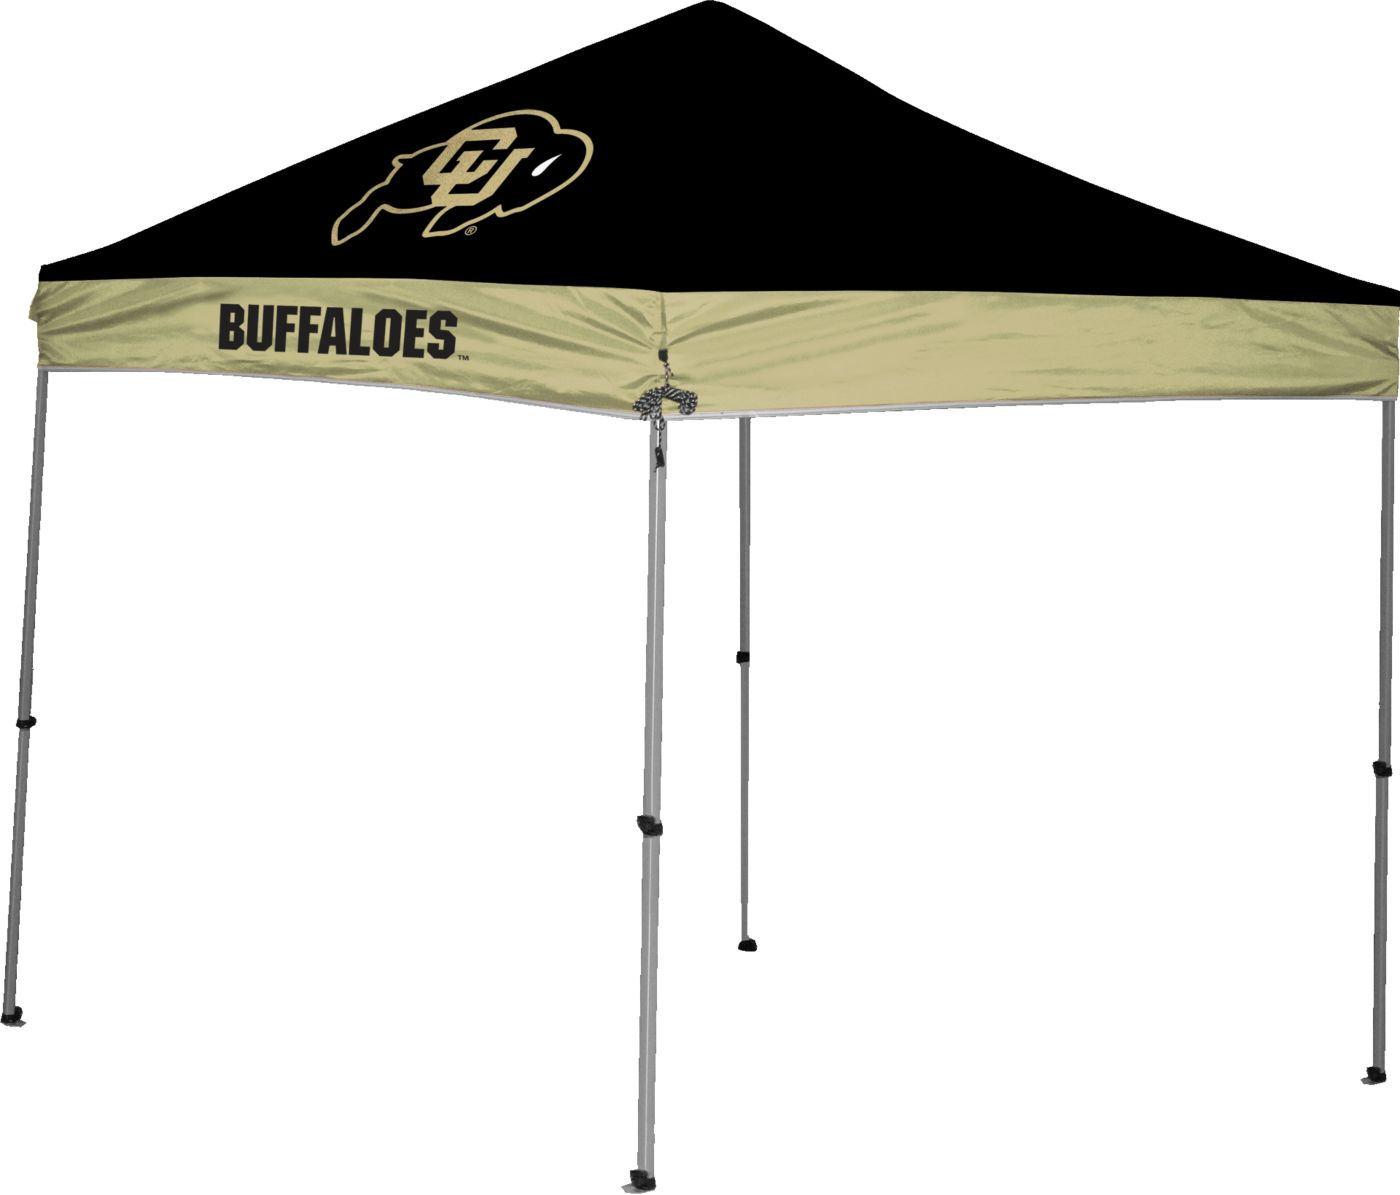 Rawlings Colorado Buffaloes 9' x 9' Sideline Canopy Tent